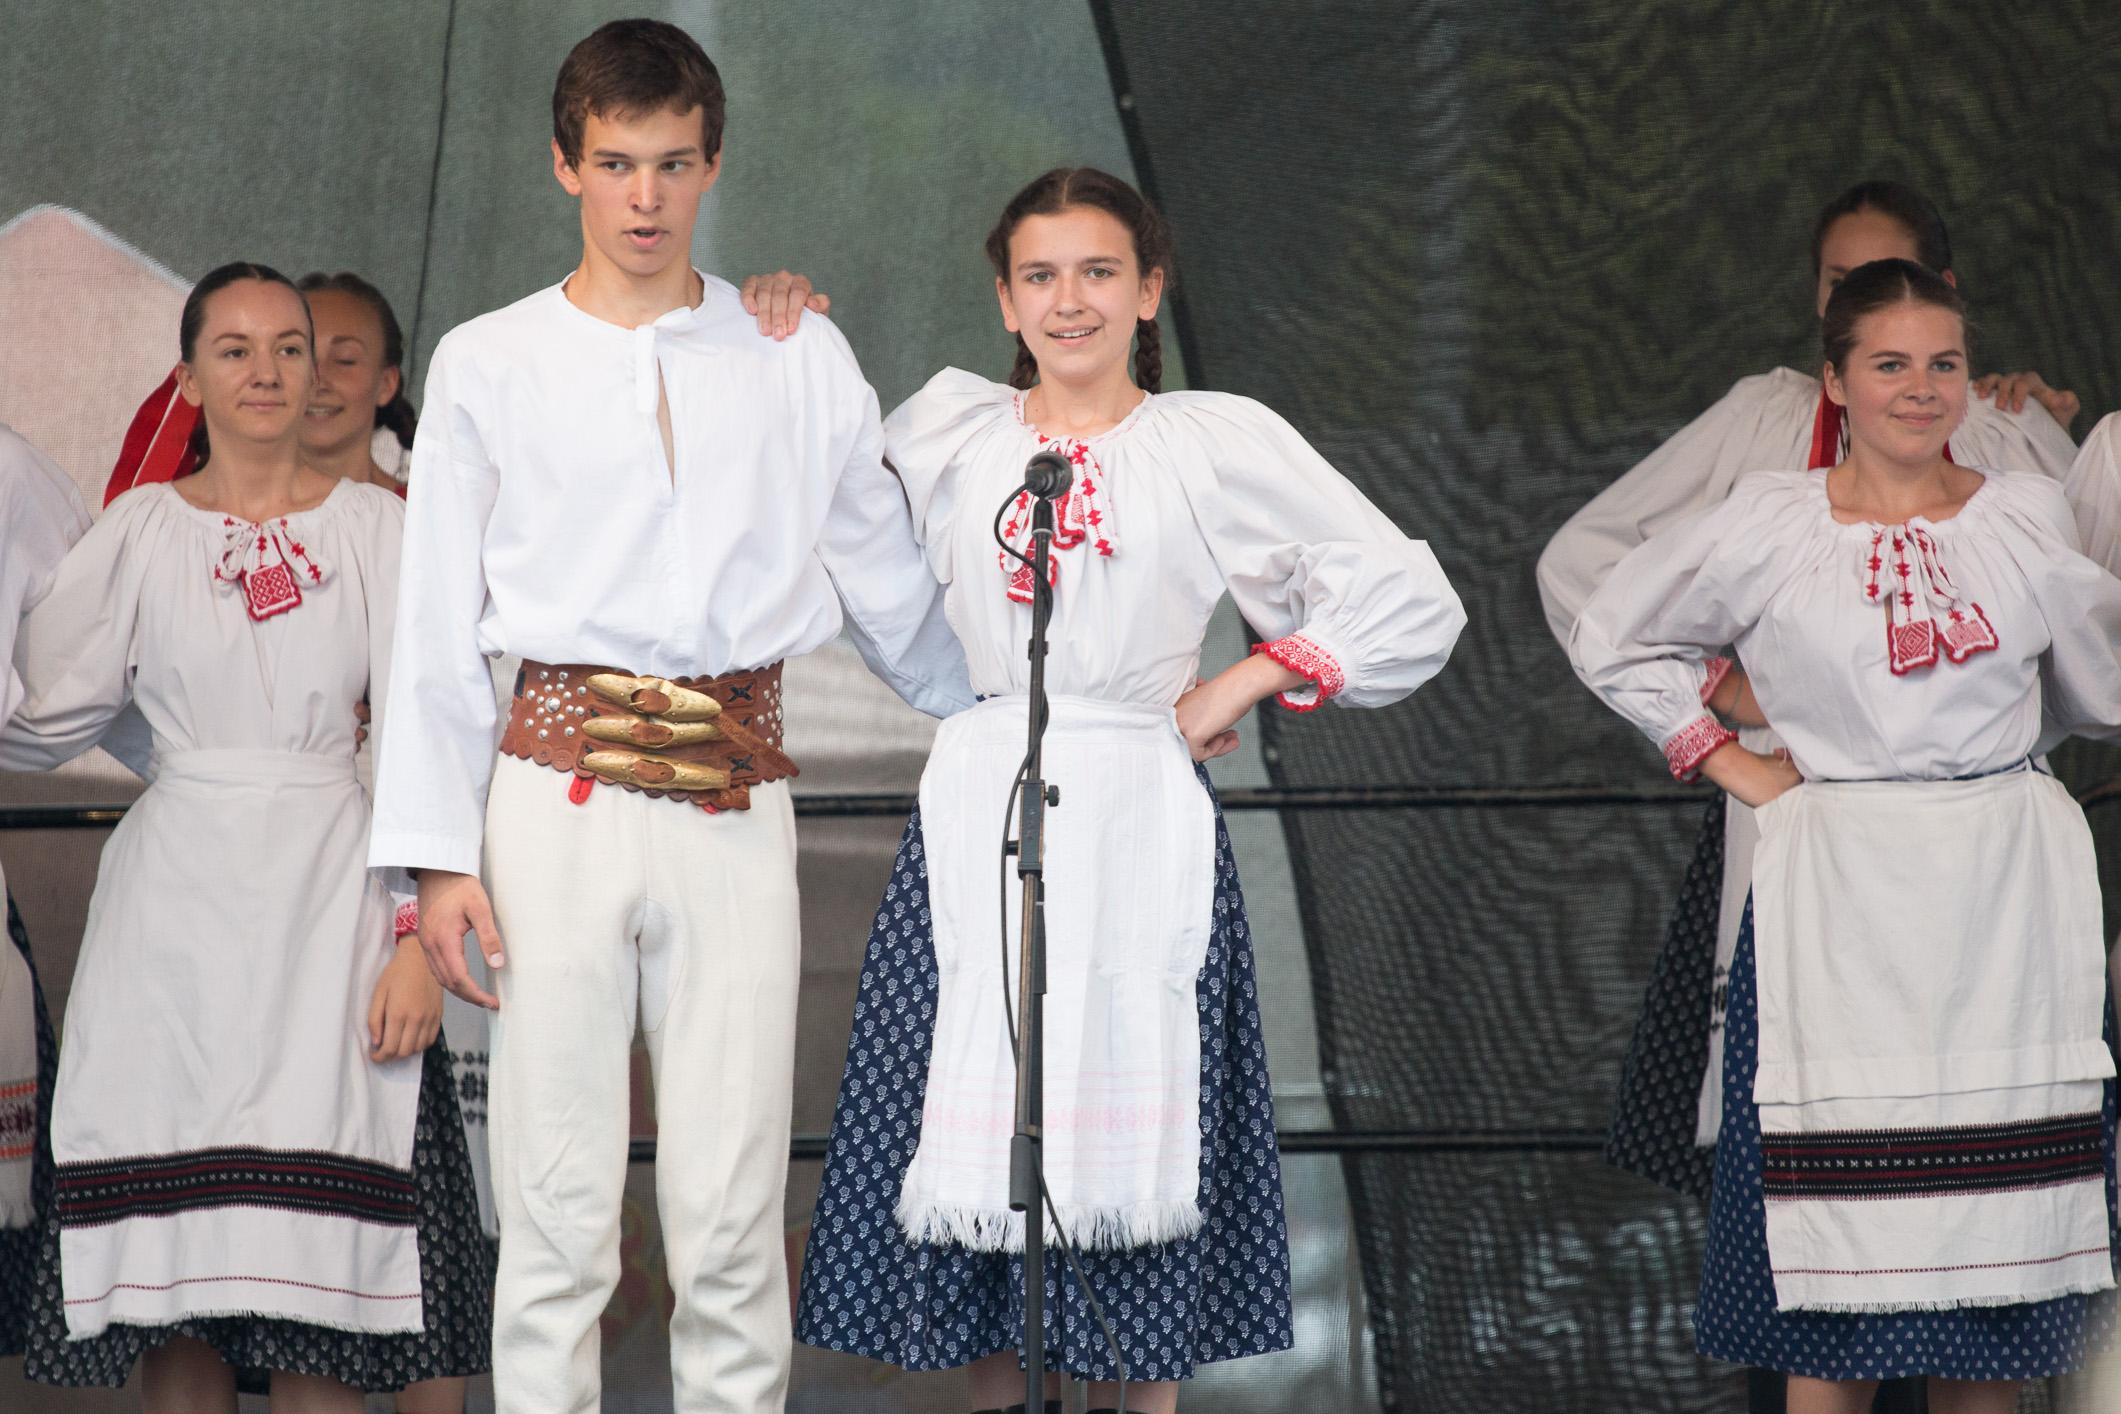 folklor-korzo-2016-zvolen-6